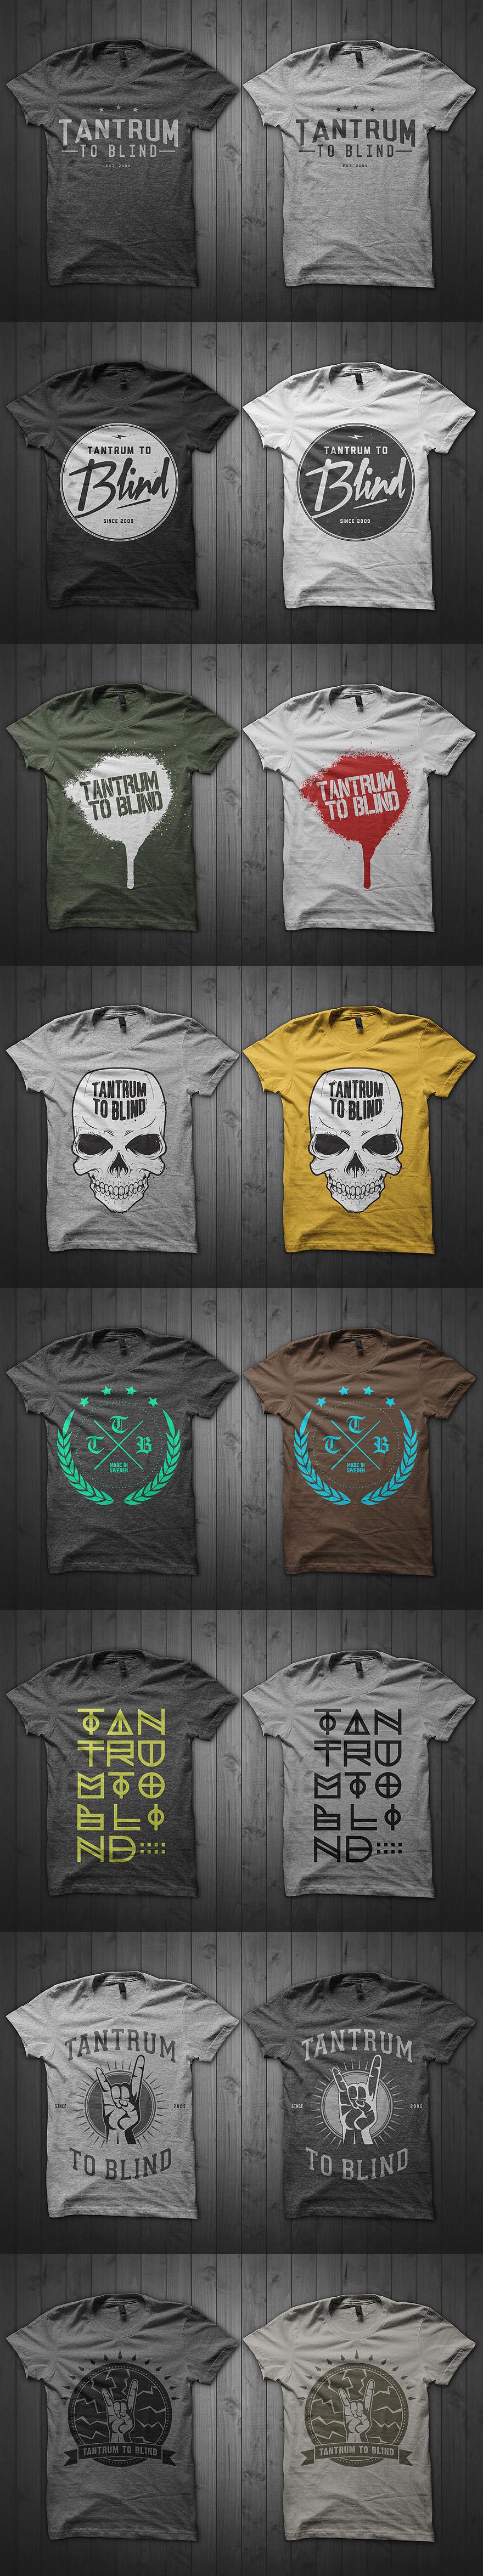 TTB Merch – T恤图案设计